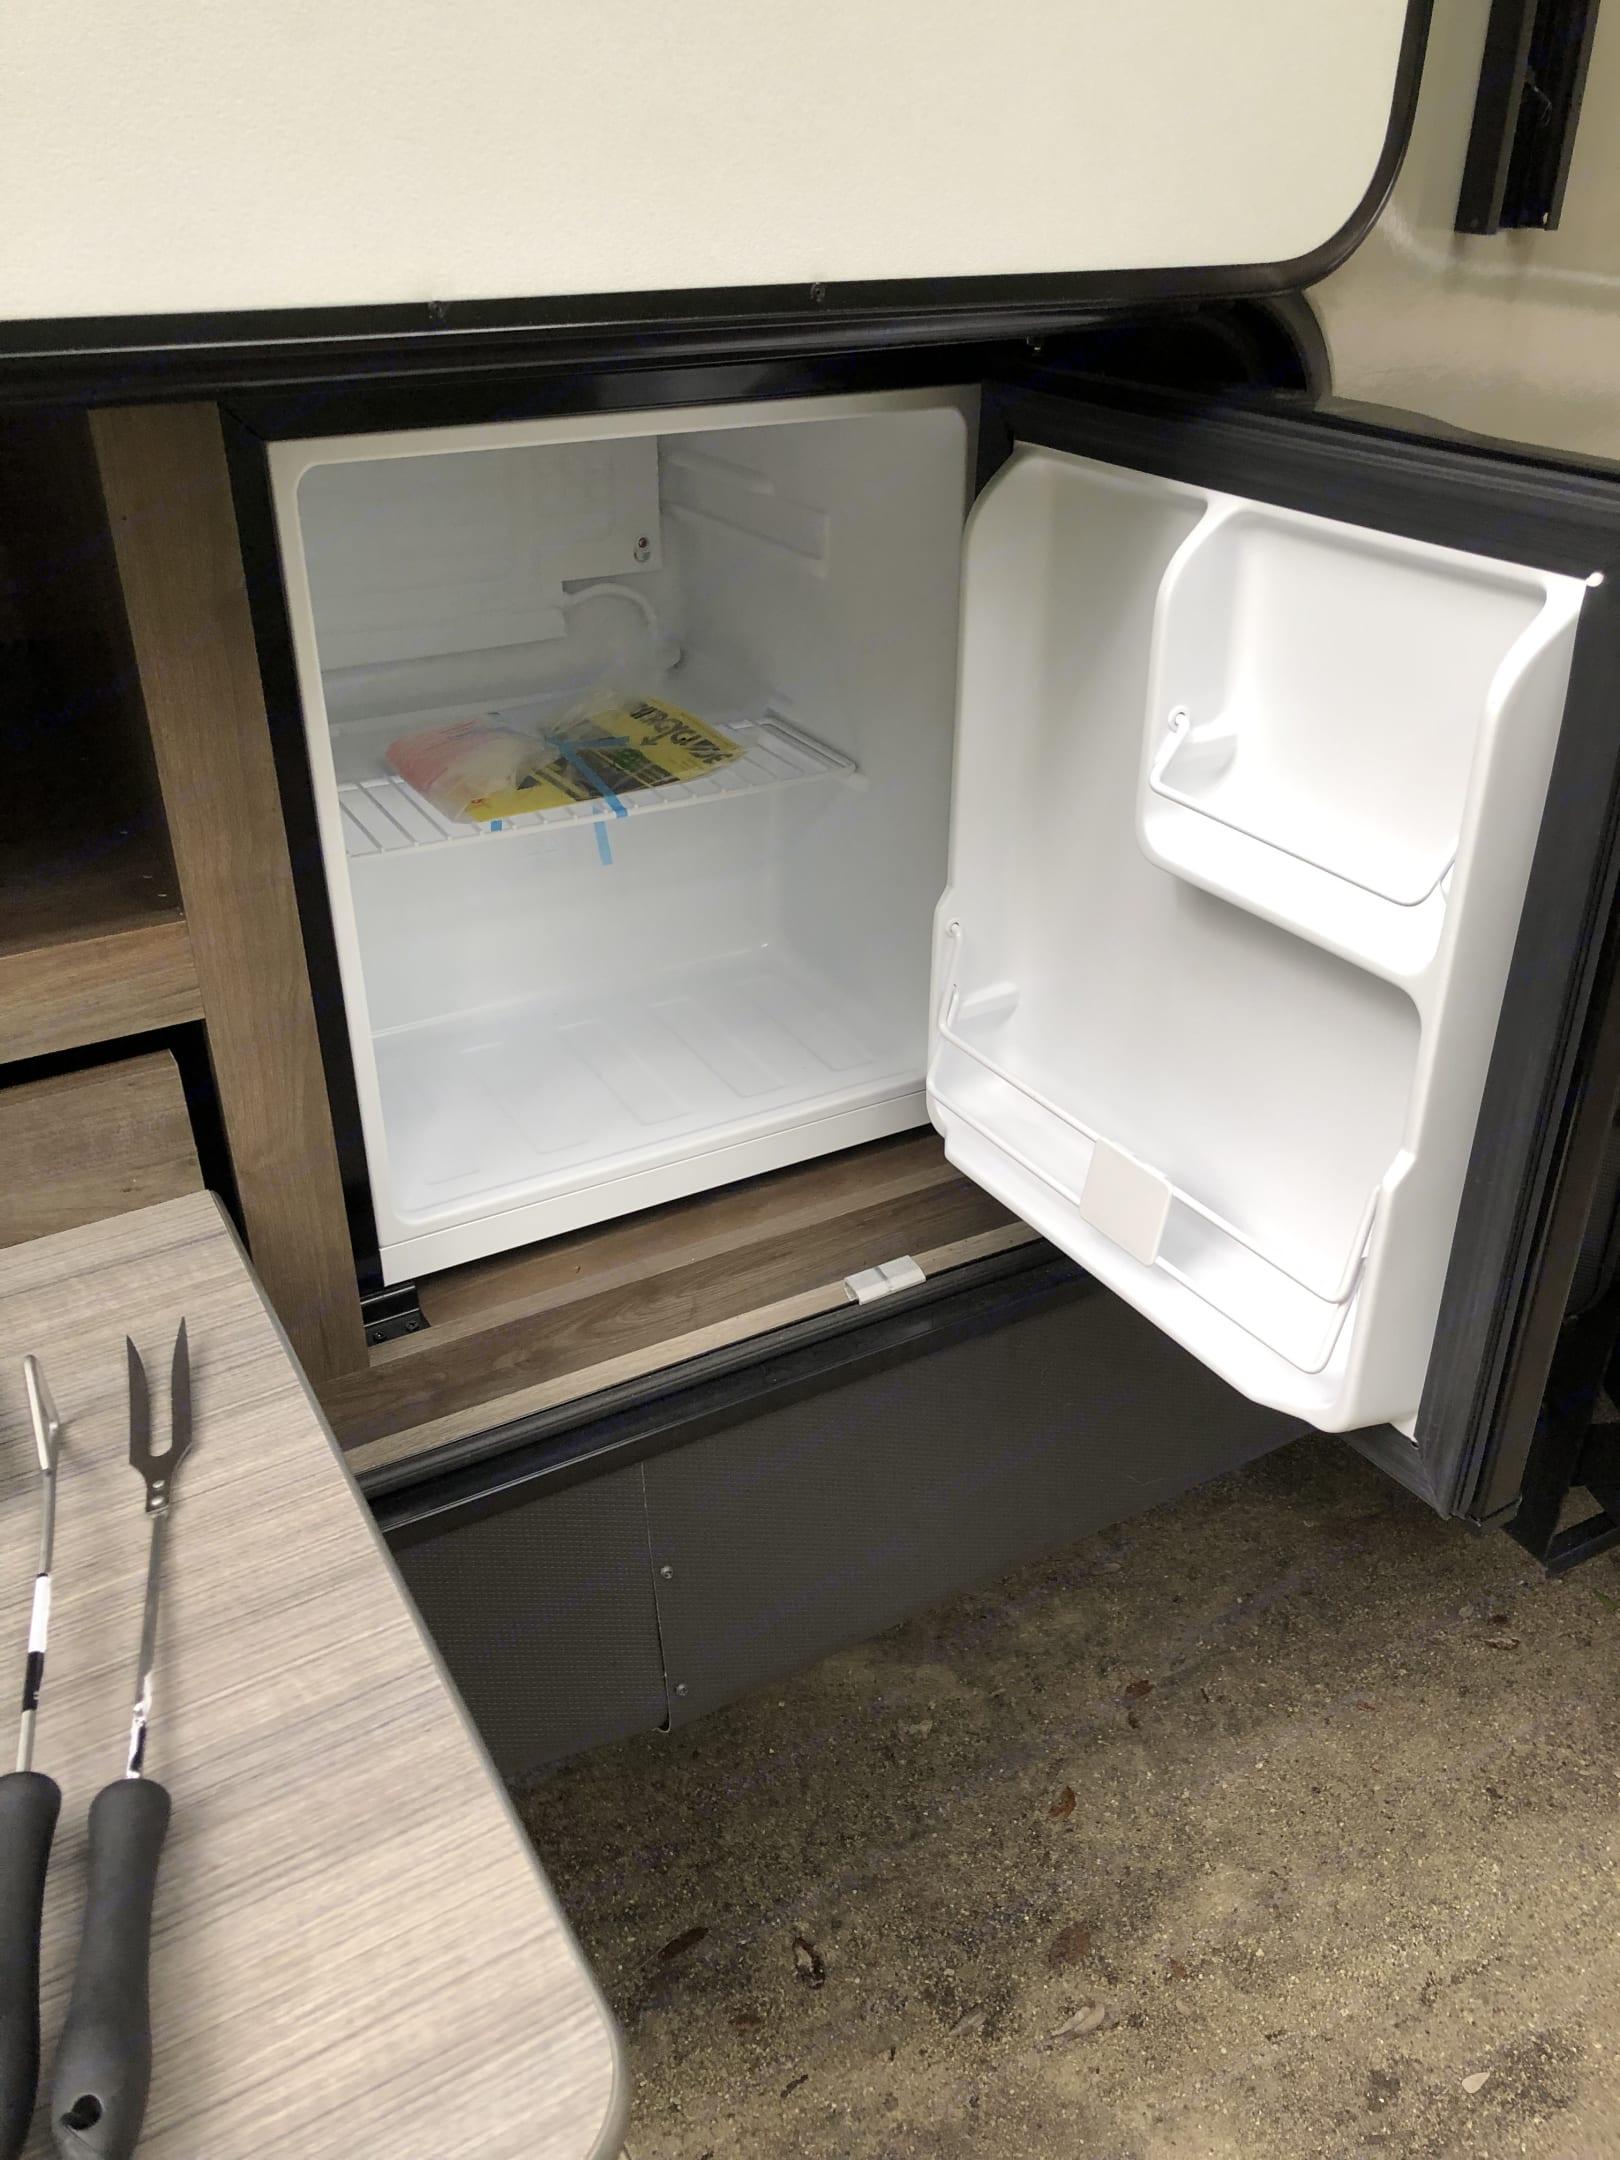 Outdoor kitchen refrigerator. (electric). Coleman 2835BH 2018